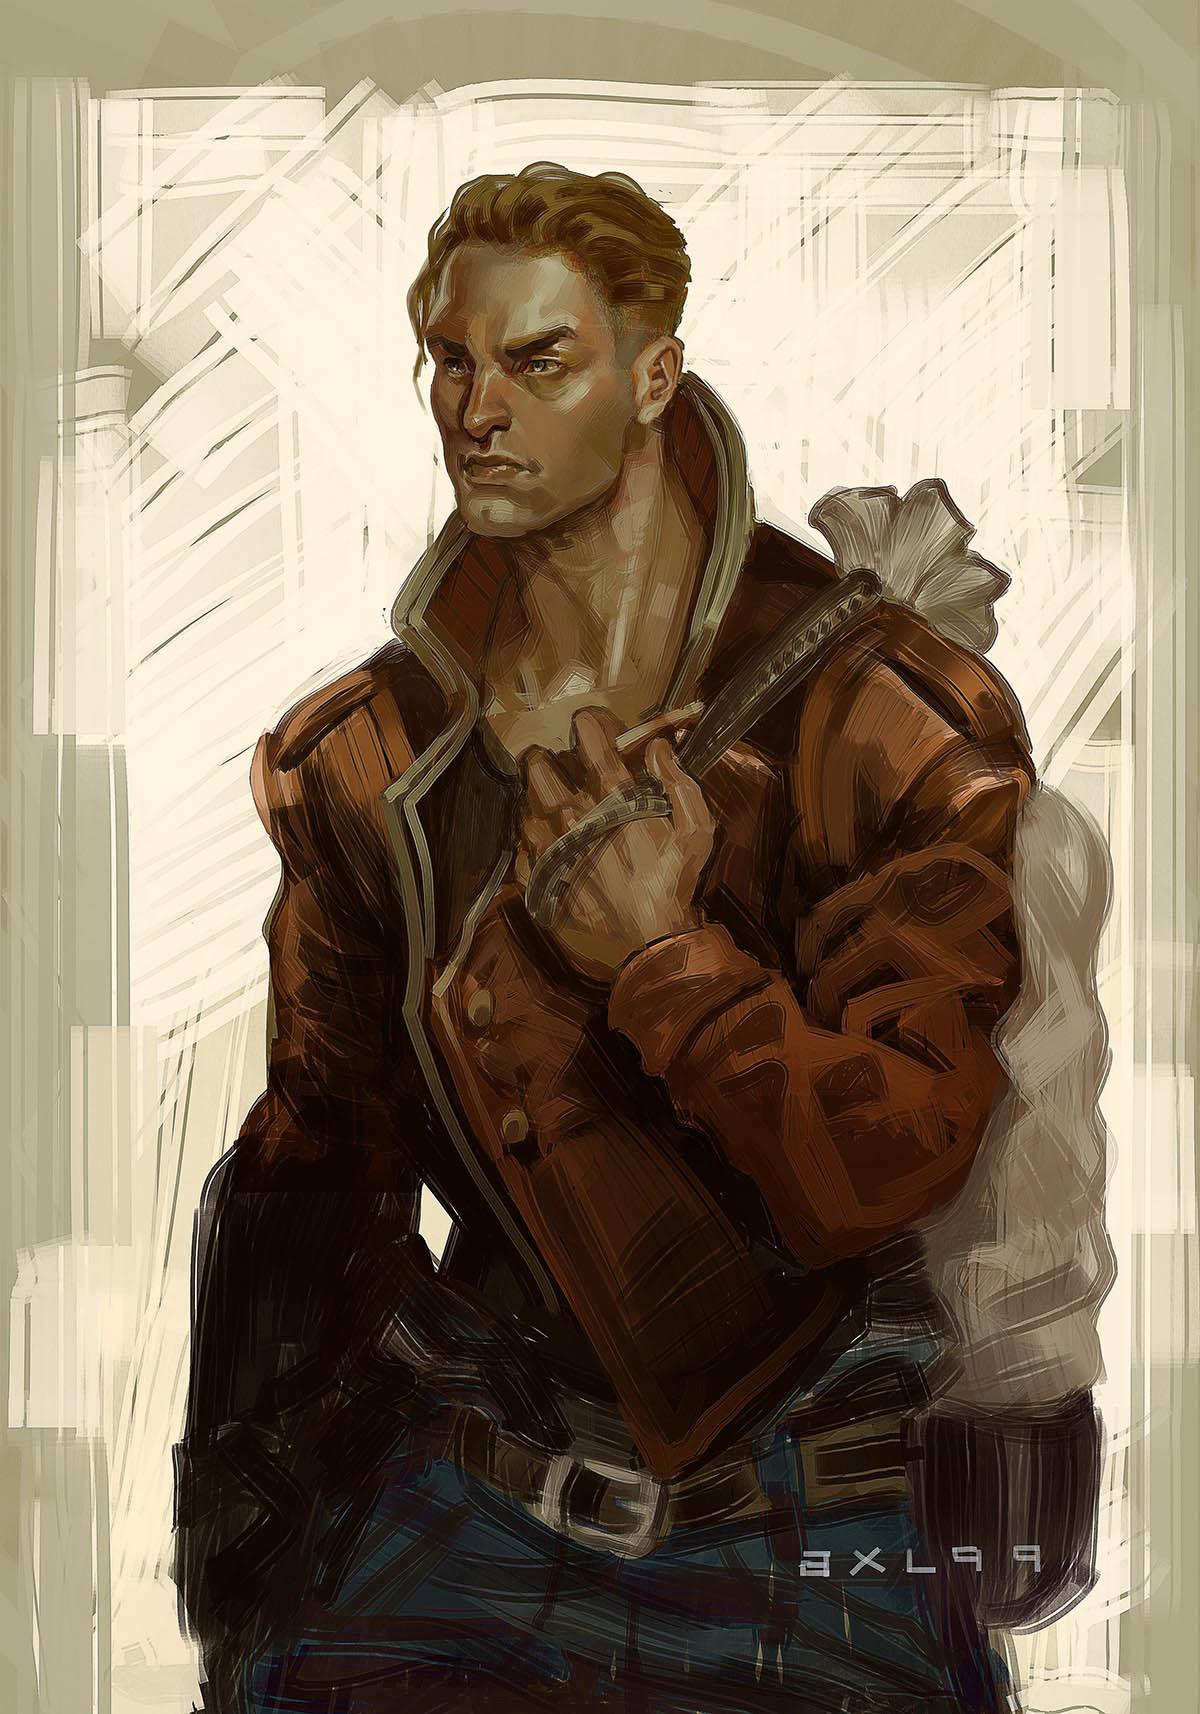 Jessie lam jacketpractice01v2